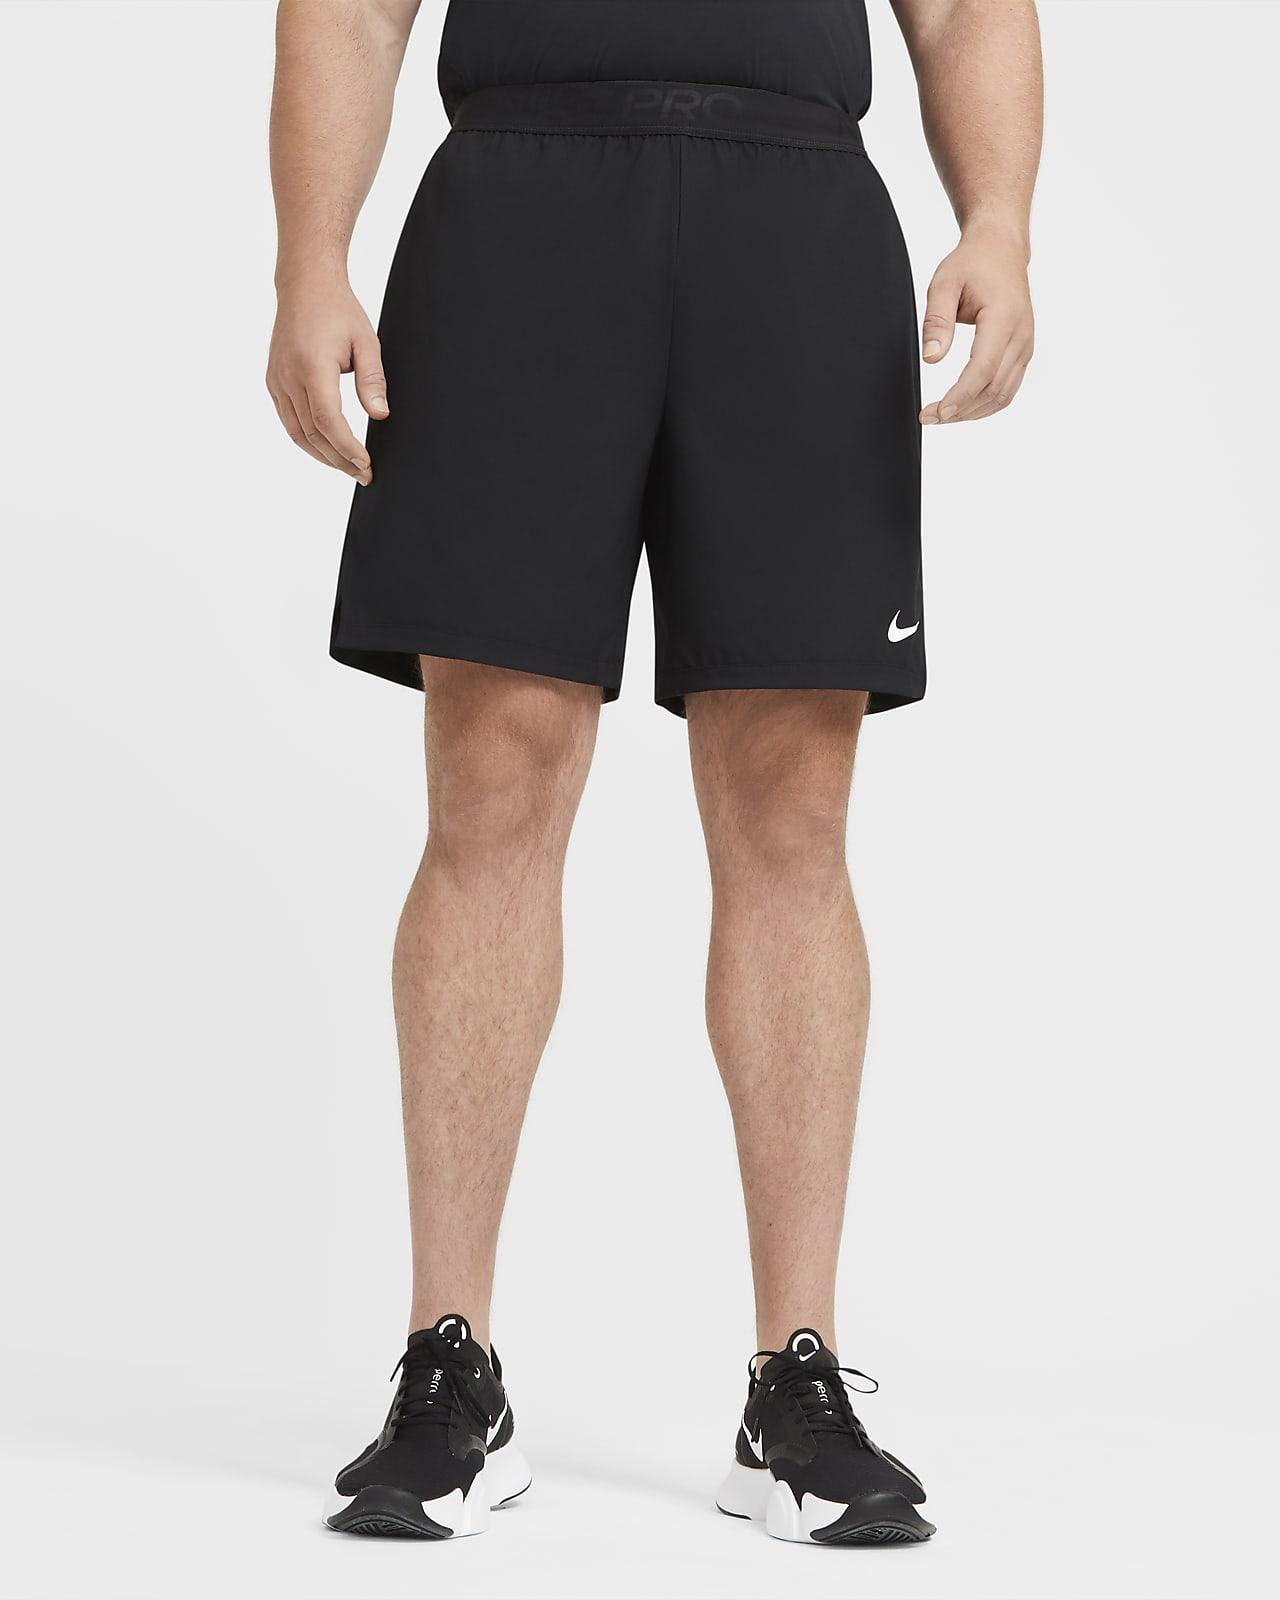 Malabares ensayo Delincuente  Nike Pro Flex Vent Max Men's Shorts. Nike AU